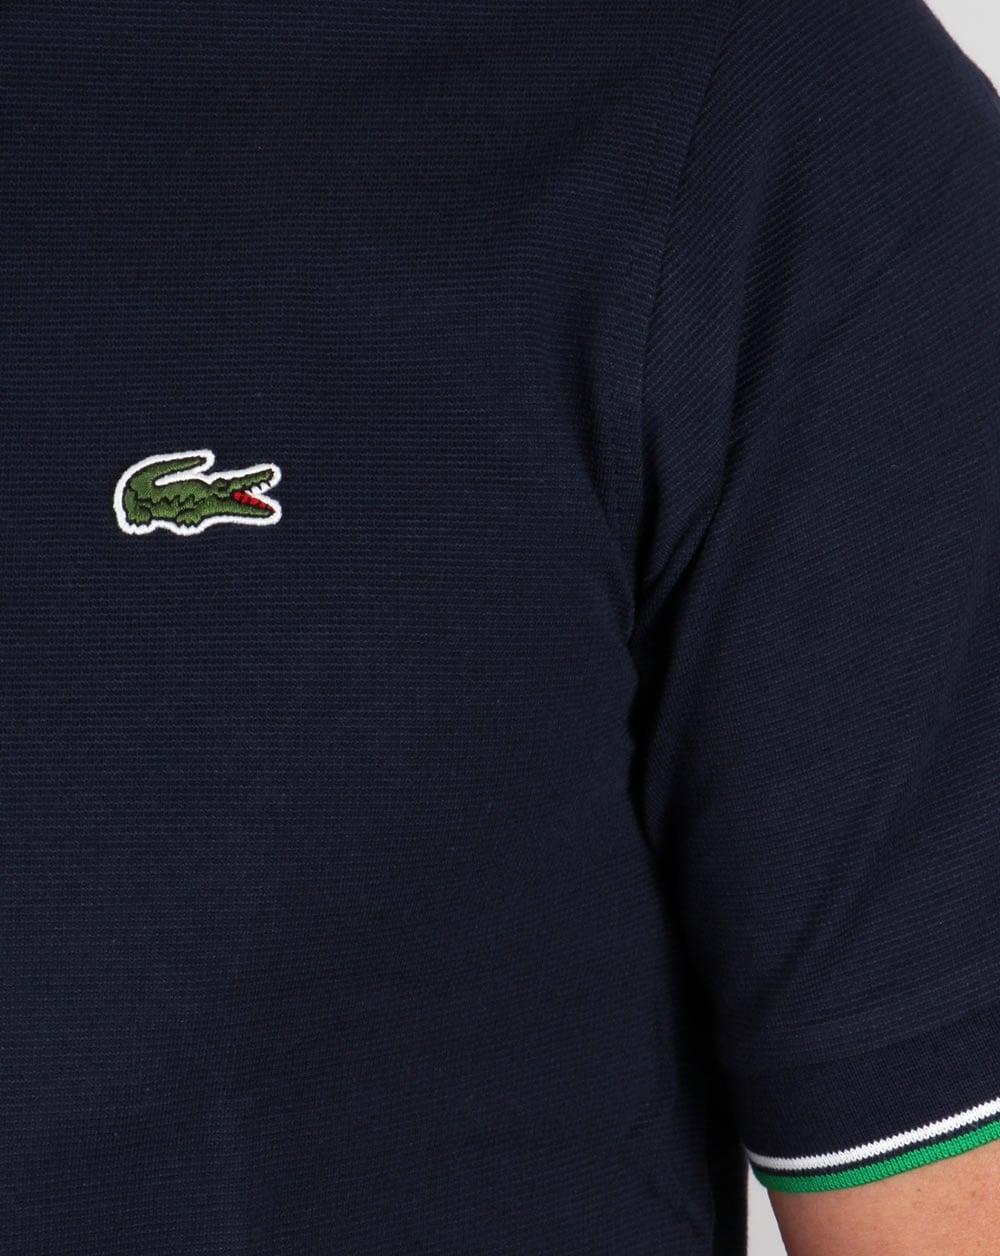 Lacoste Tipped Polo Shirt Navygreensportmens